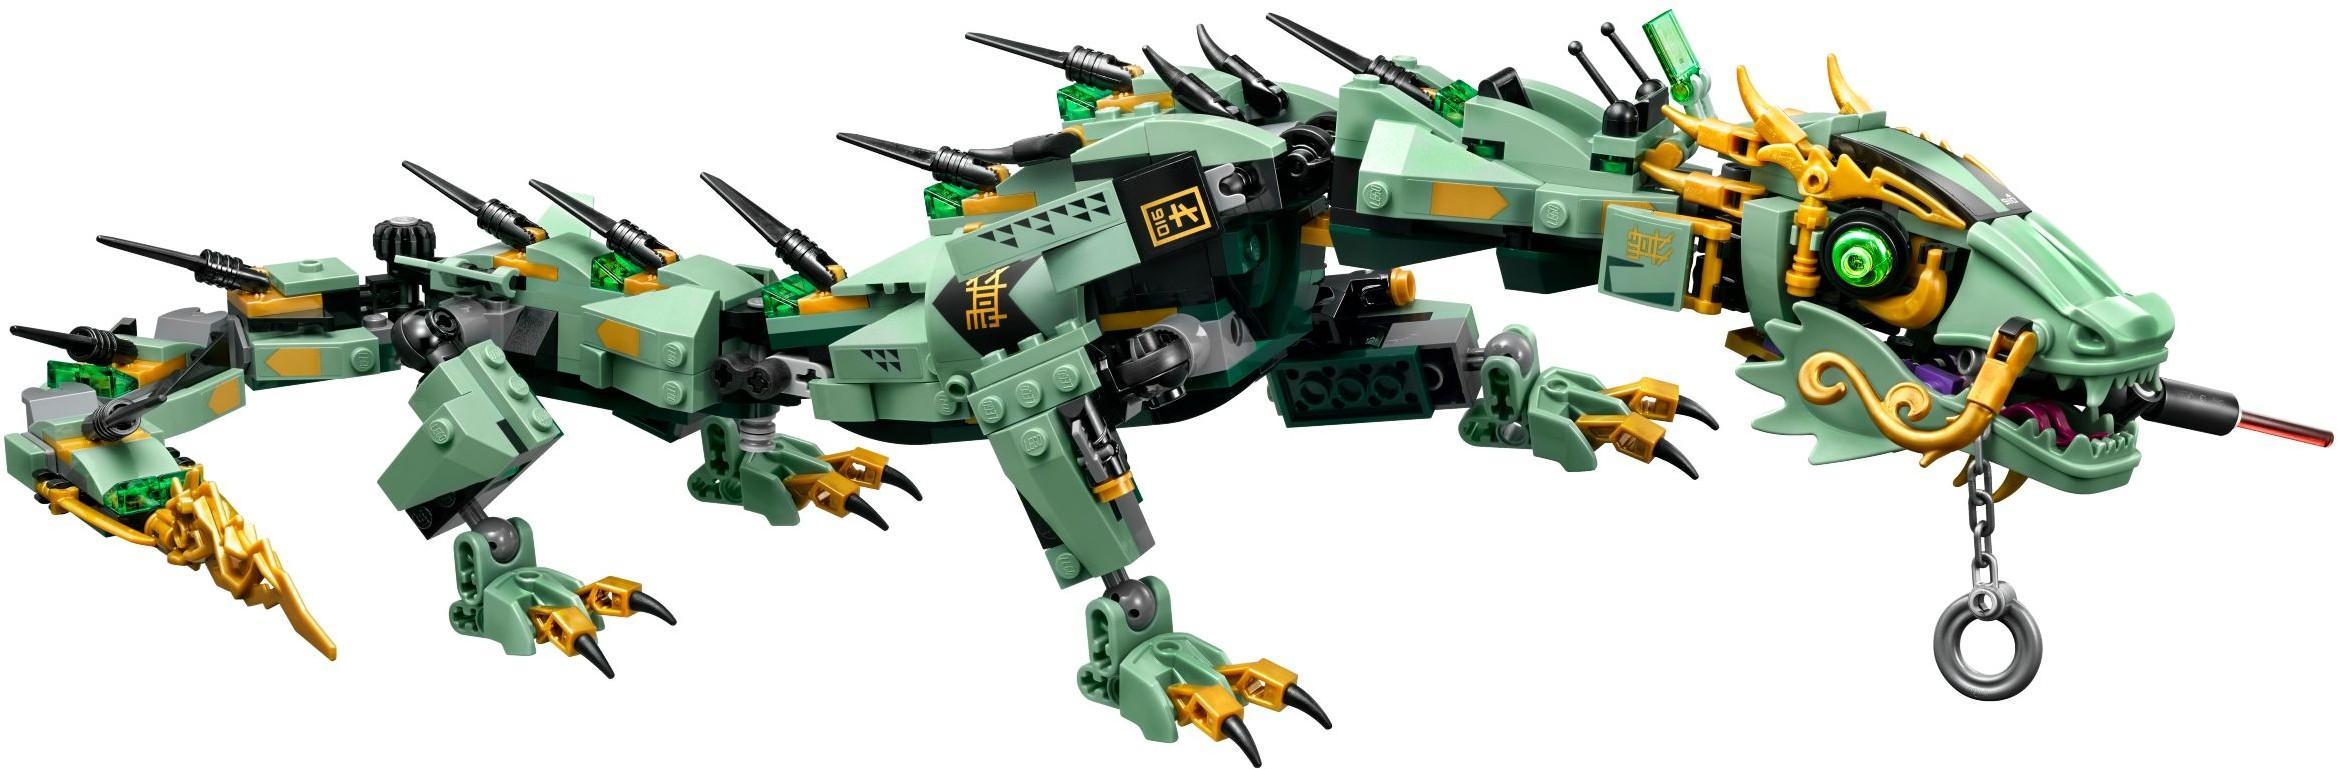 Lloyd De 70612 D'acier Lego Le Dragon Ninjago dxerWCBo